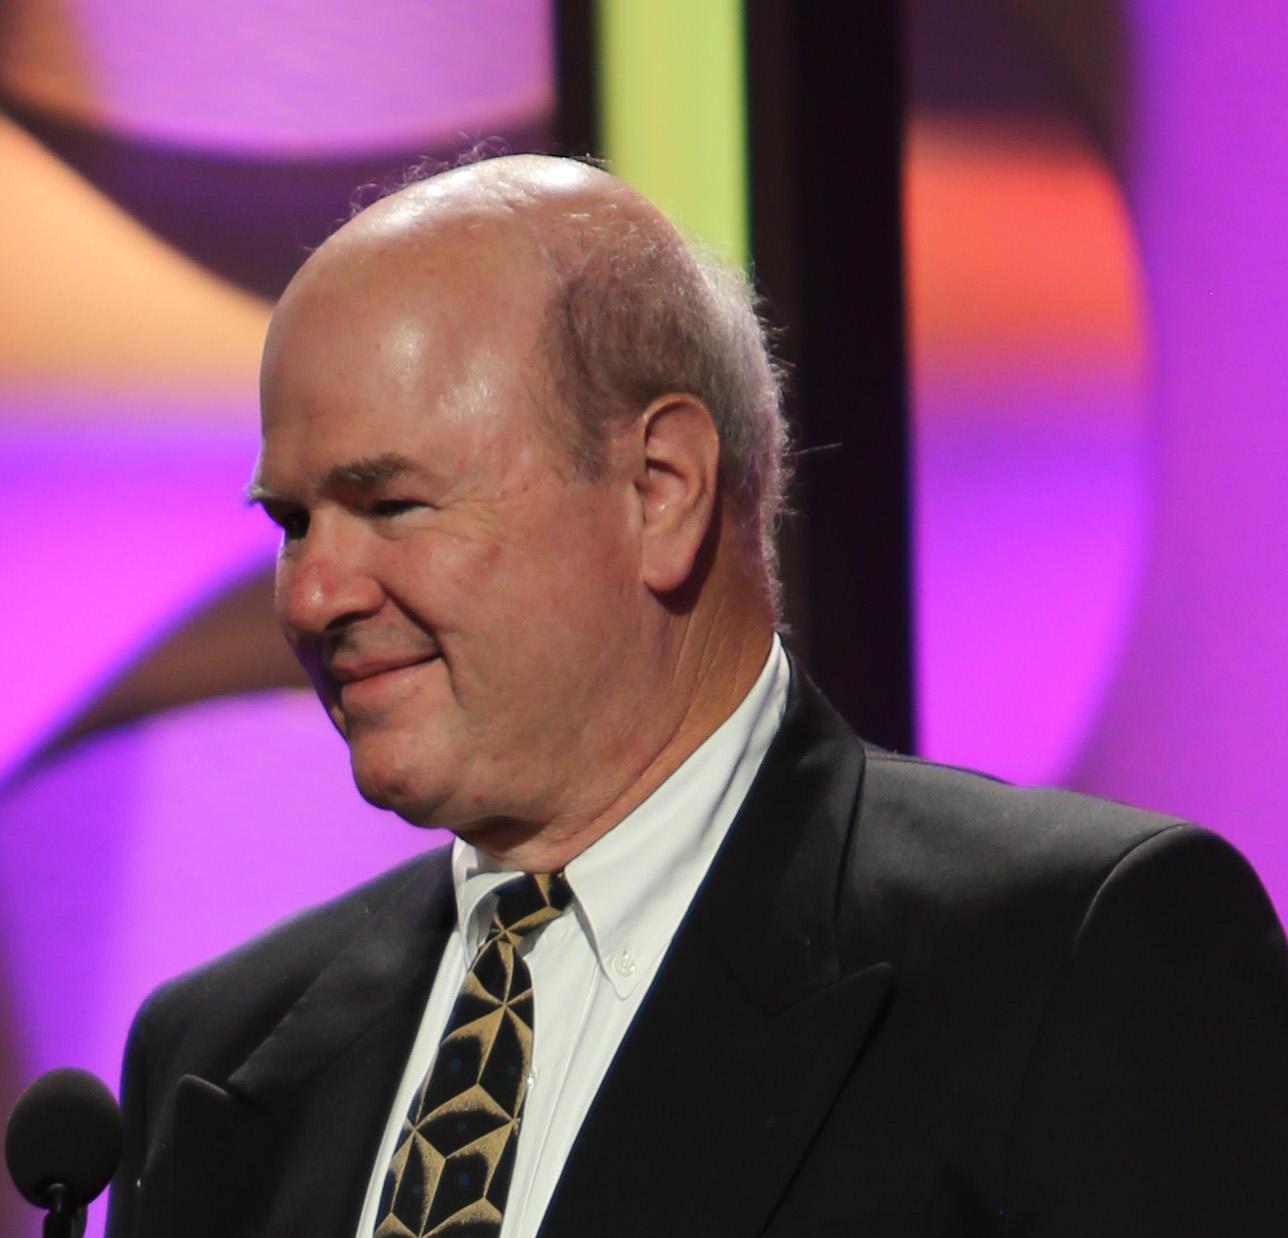 Portrait picture of Larry Miller